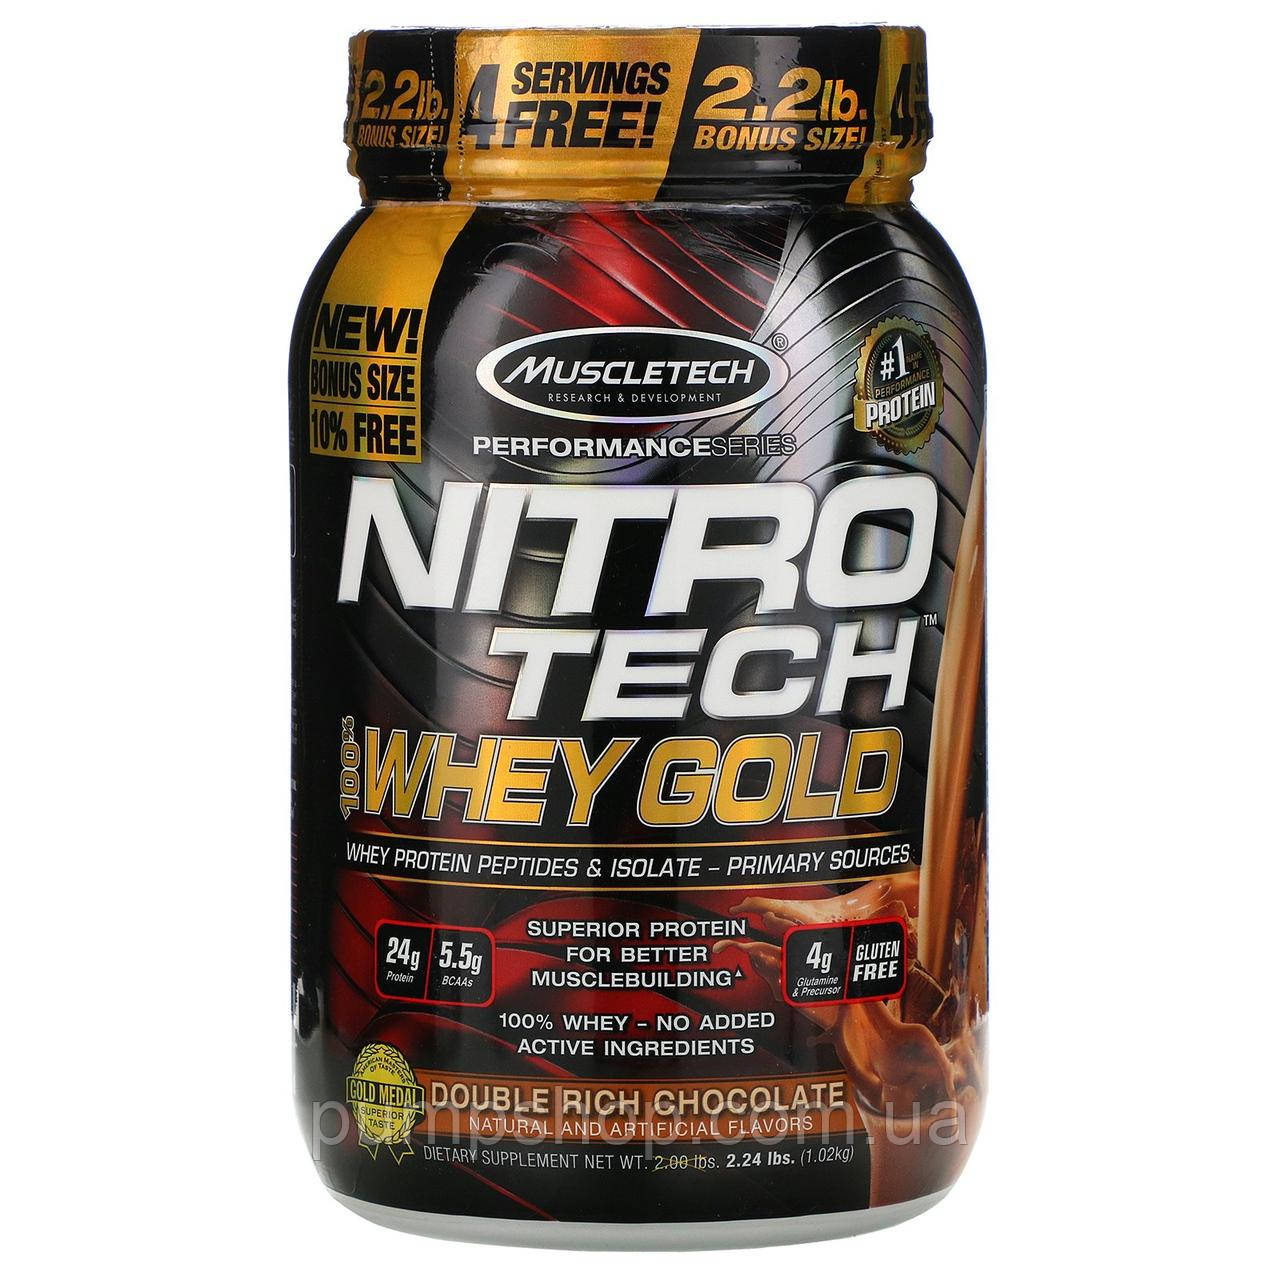 Сывороточный изолят протеин MuscleTech Nitro-Tech Whey Gold 1810 г